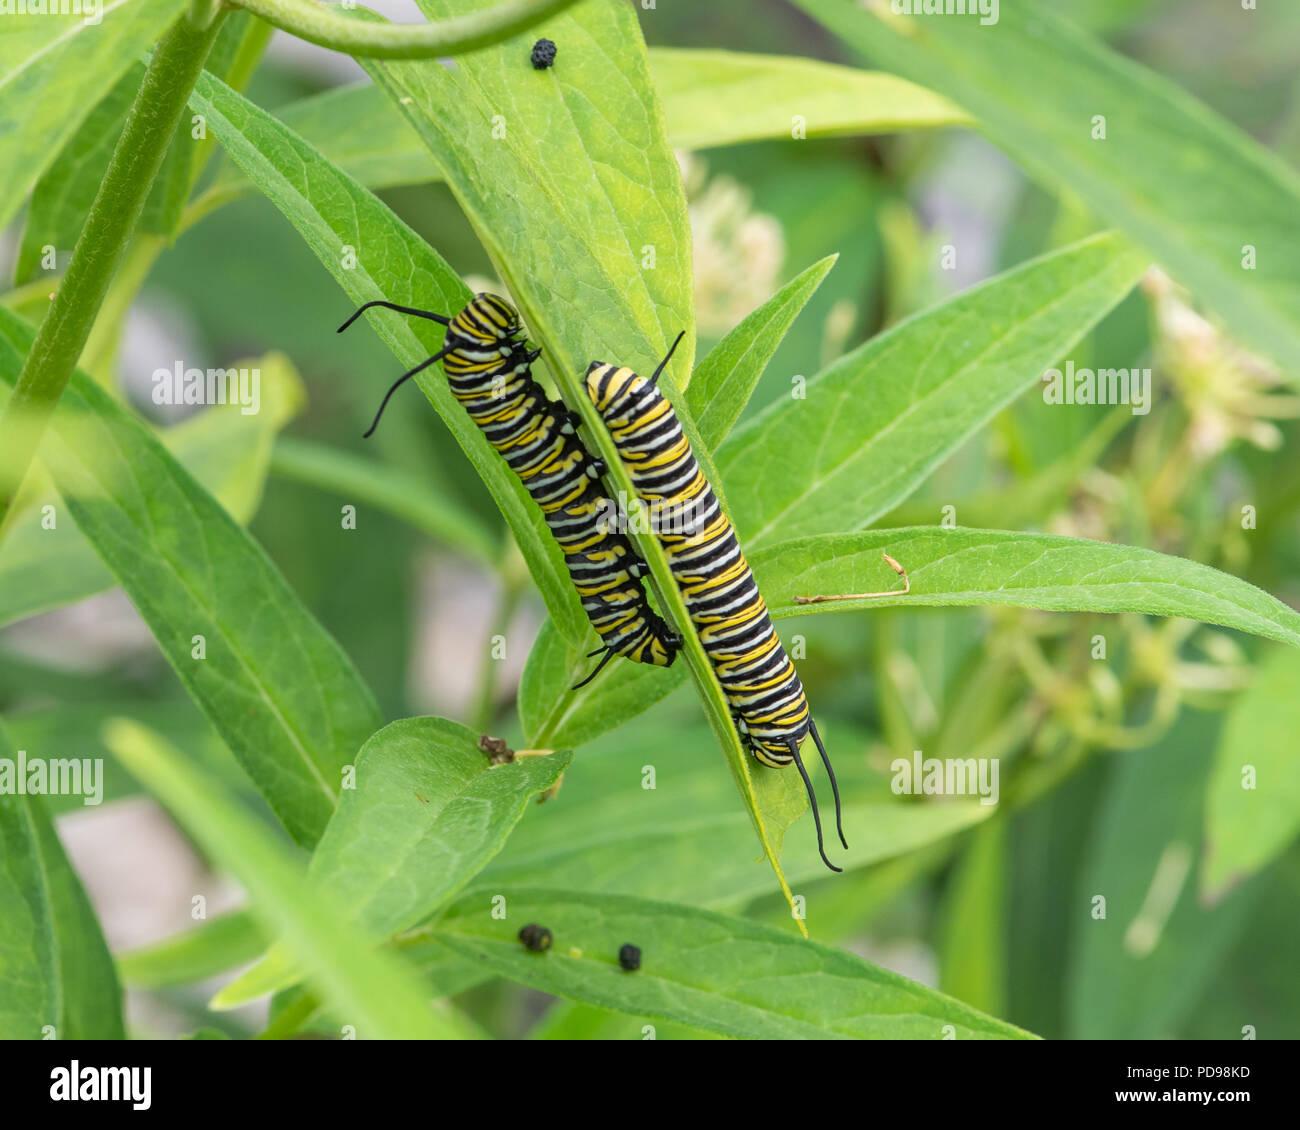 Dos orugas de la mariposa monarca, Danaus plexippus, alimentándose de pantano, Asclepias asclepias incarnata, en un jardín en el especulador, NY ESTADOS UNIDOS Foto de stock